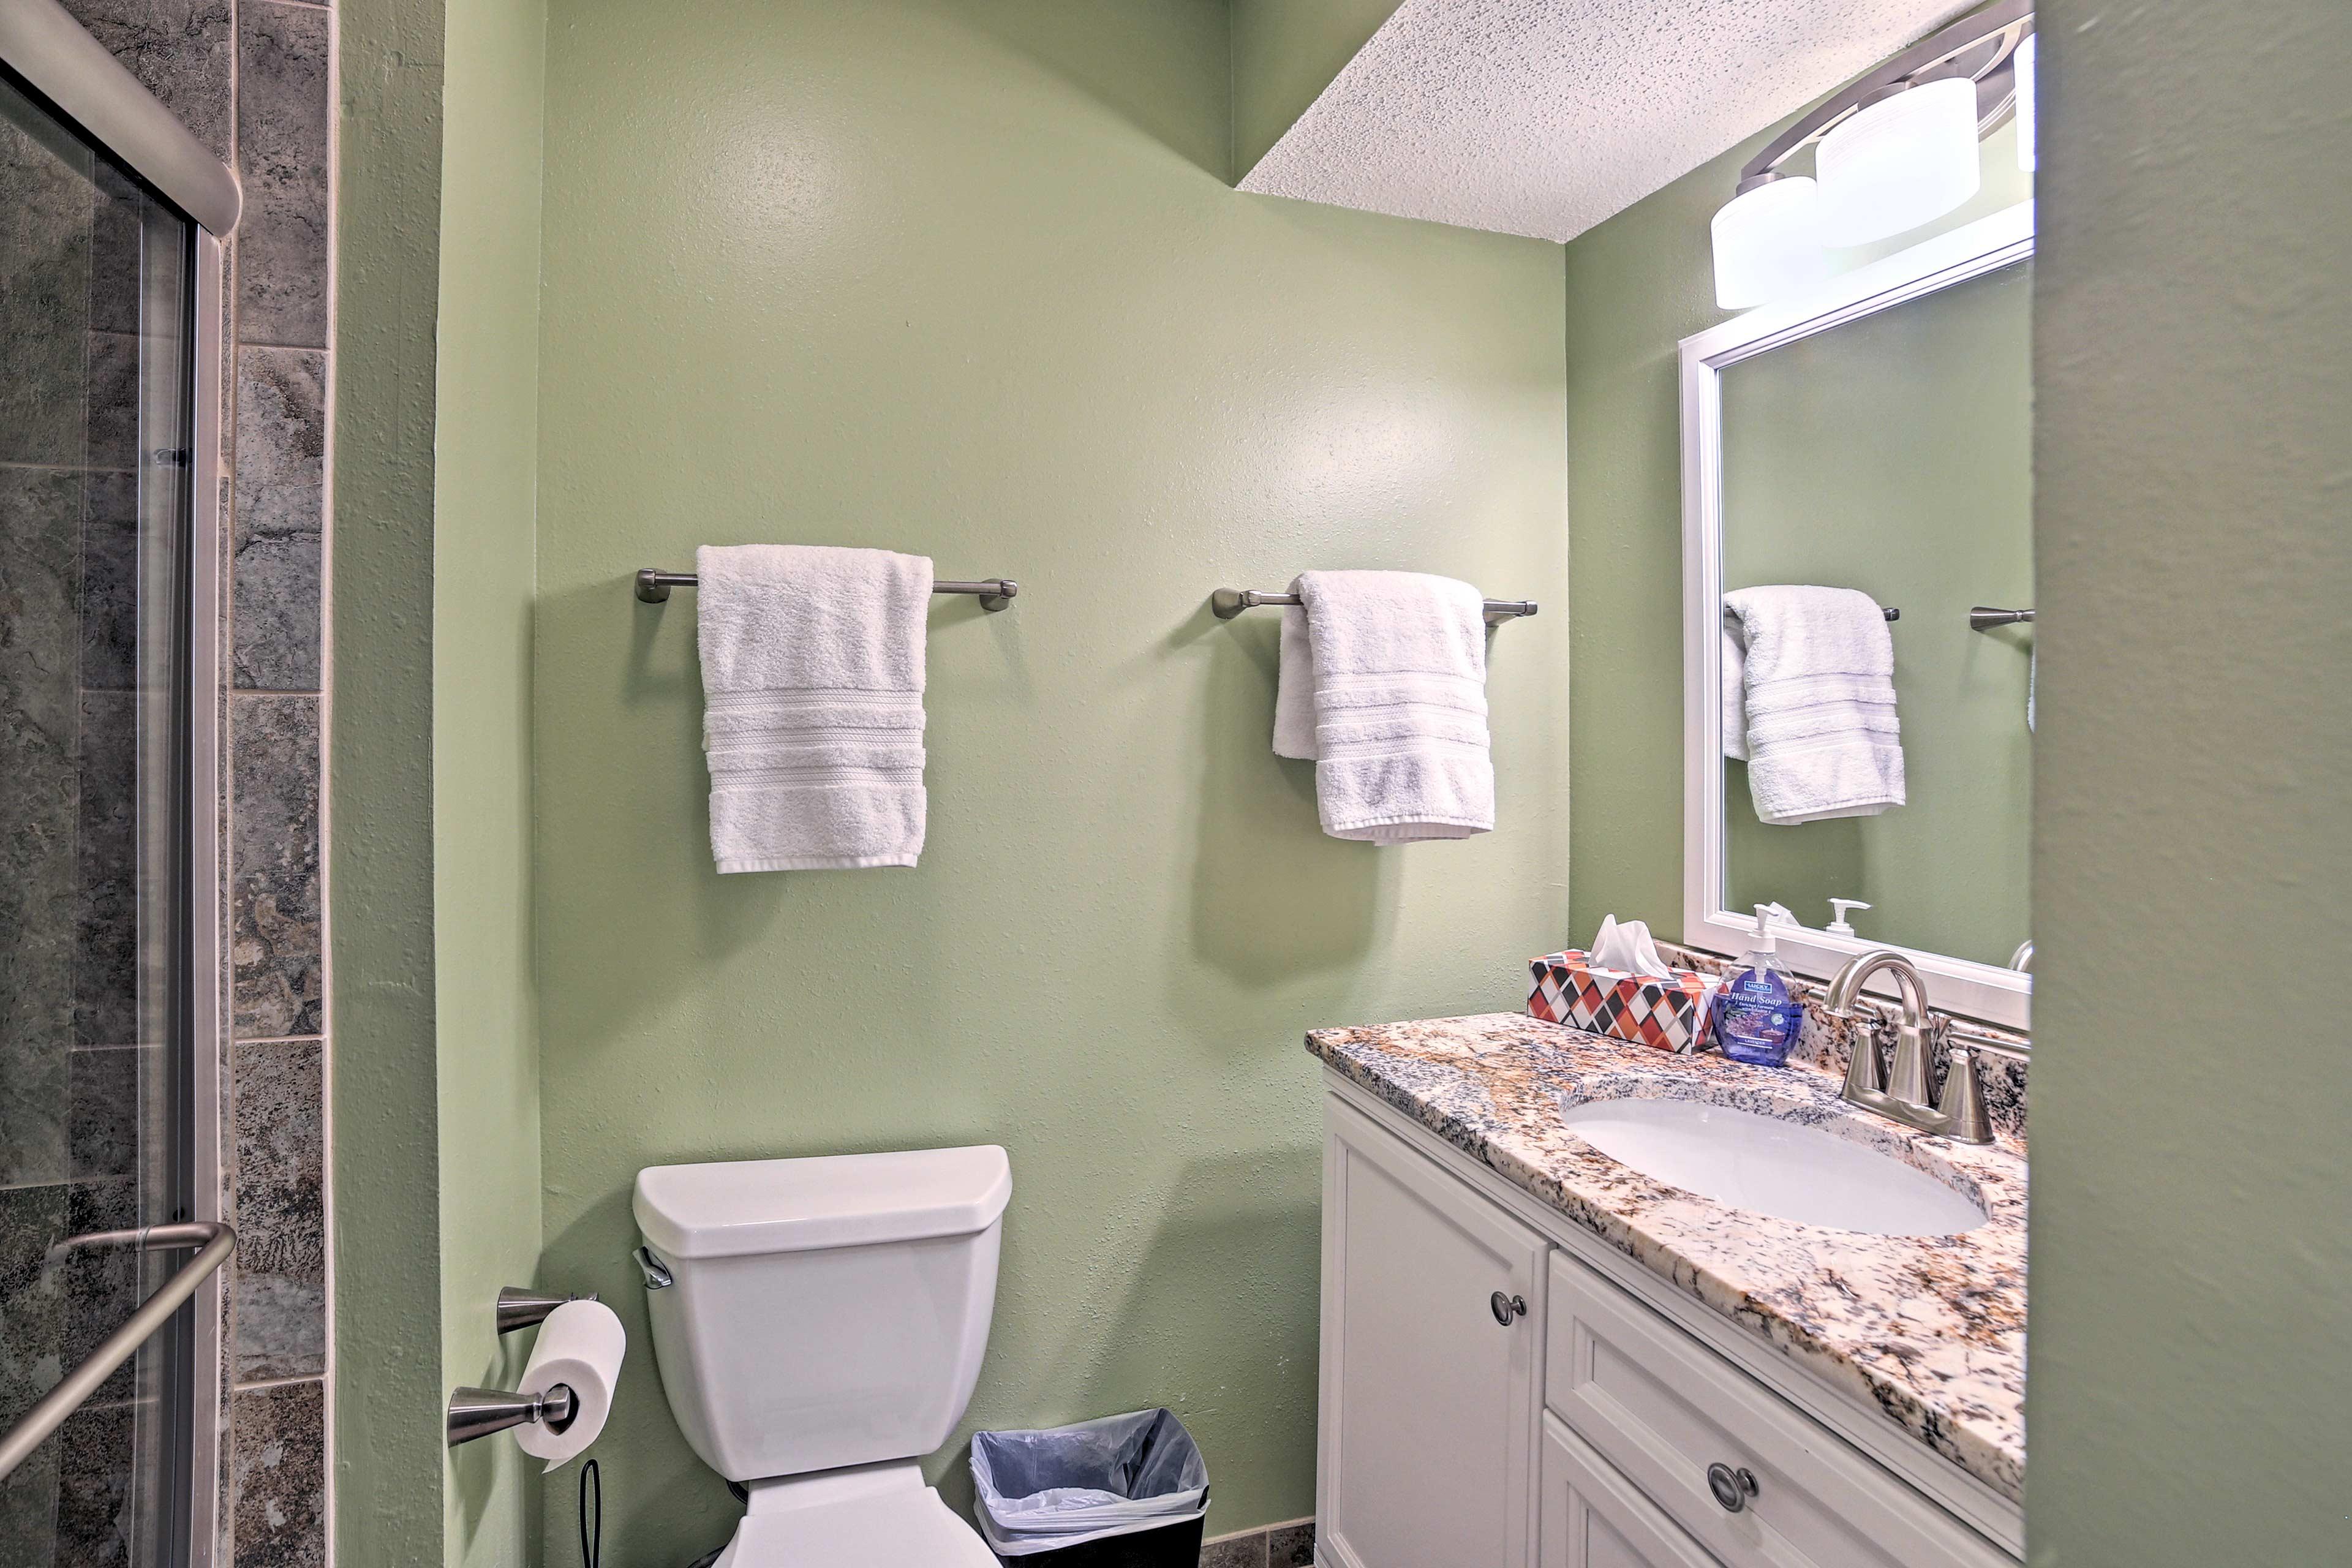 Rinse off in 1 of 2 full bathrooms.